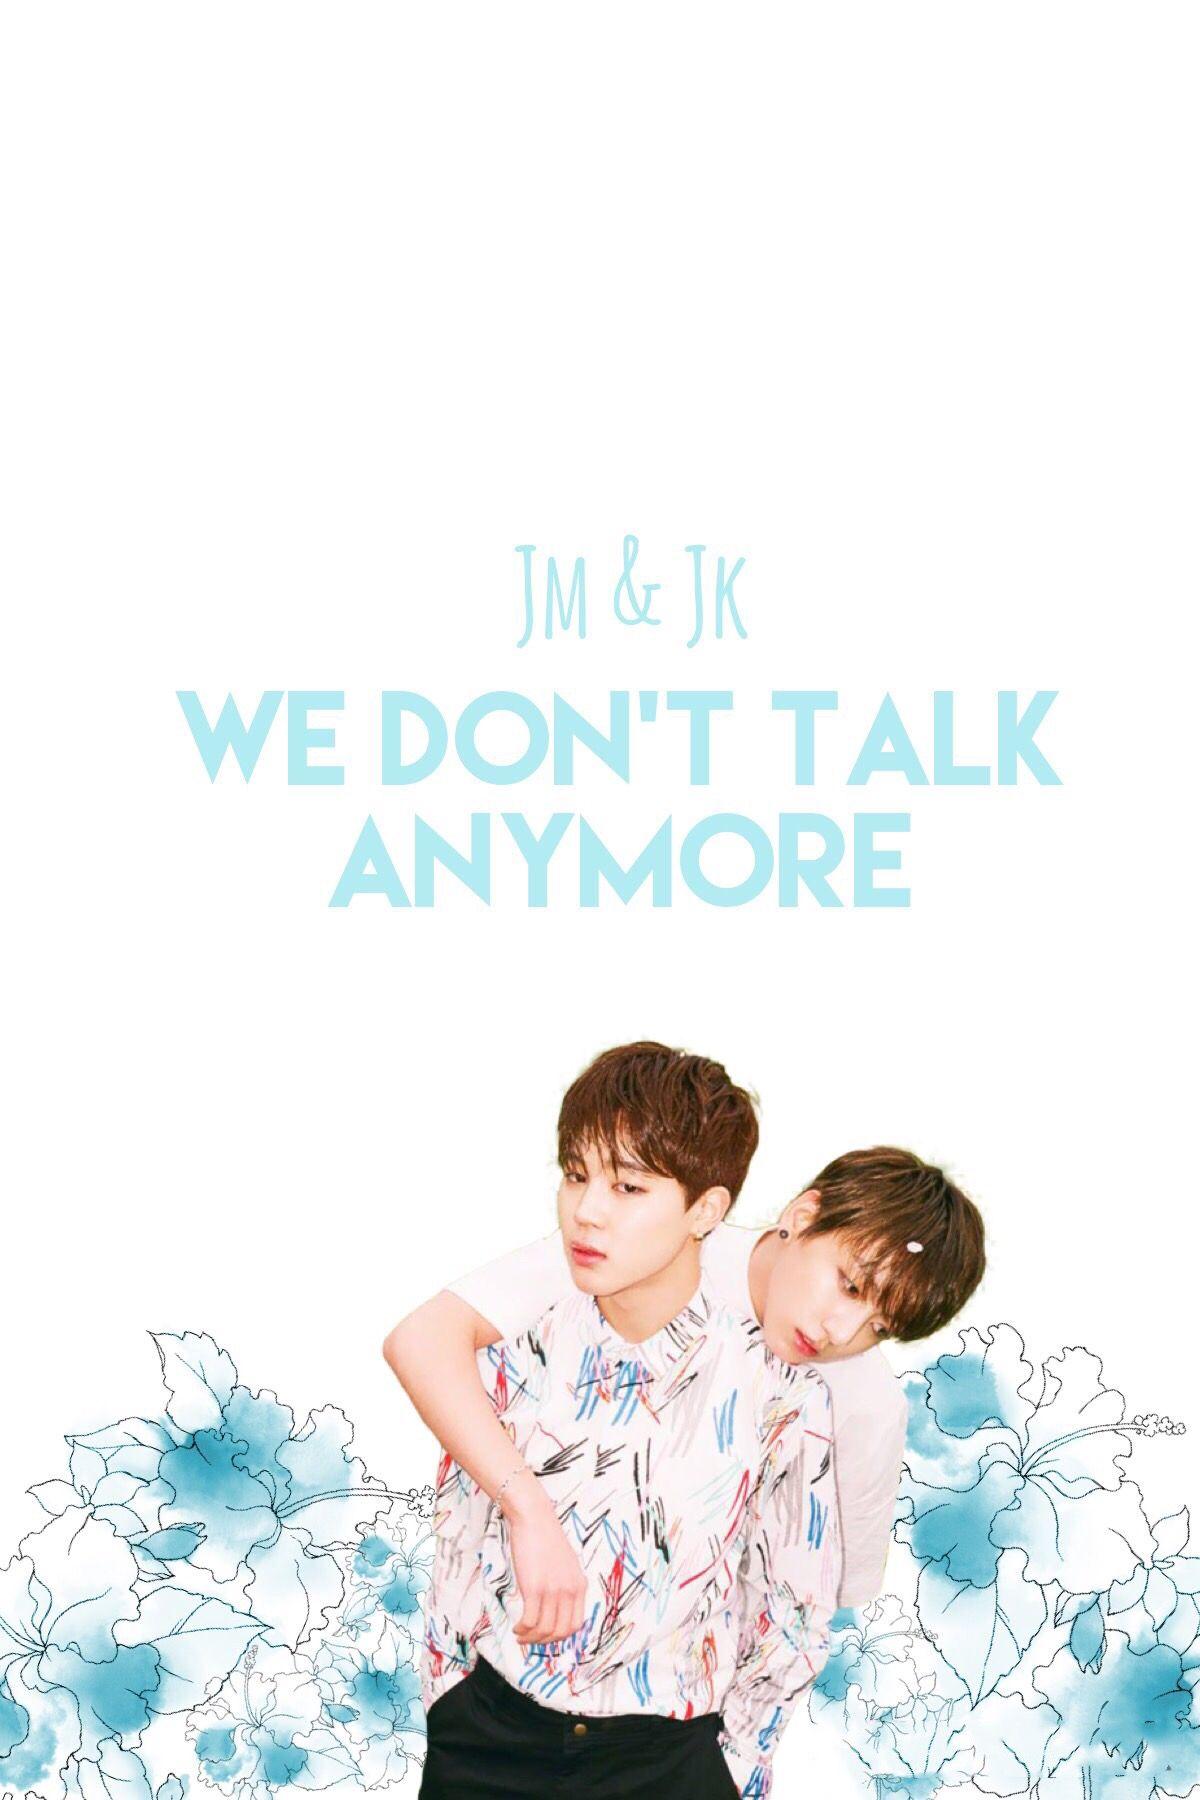 Bts Wallpaper We Don T Talk Anymore Jimin Jungkook Cover We